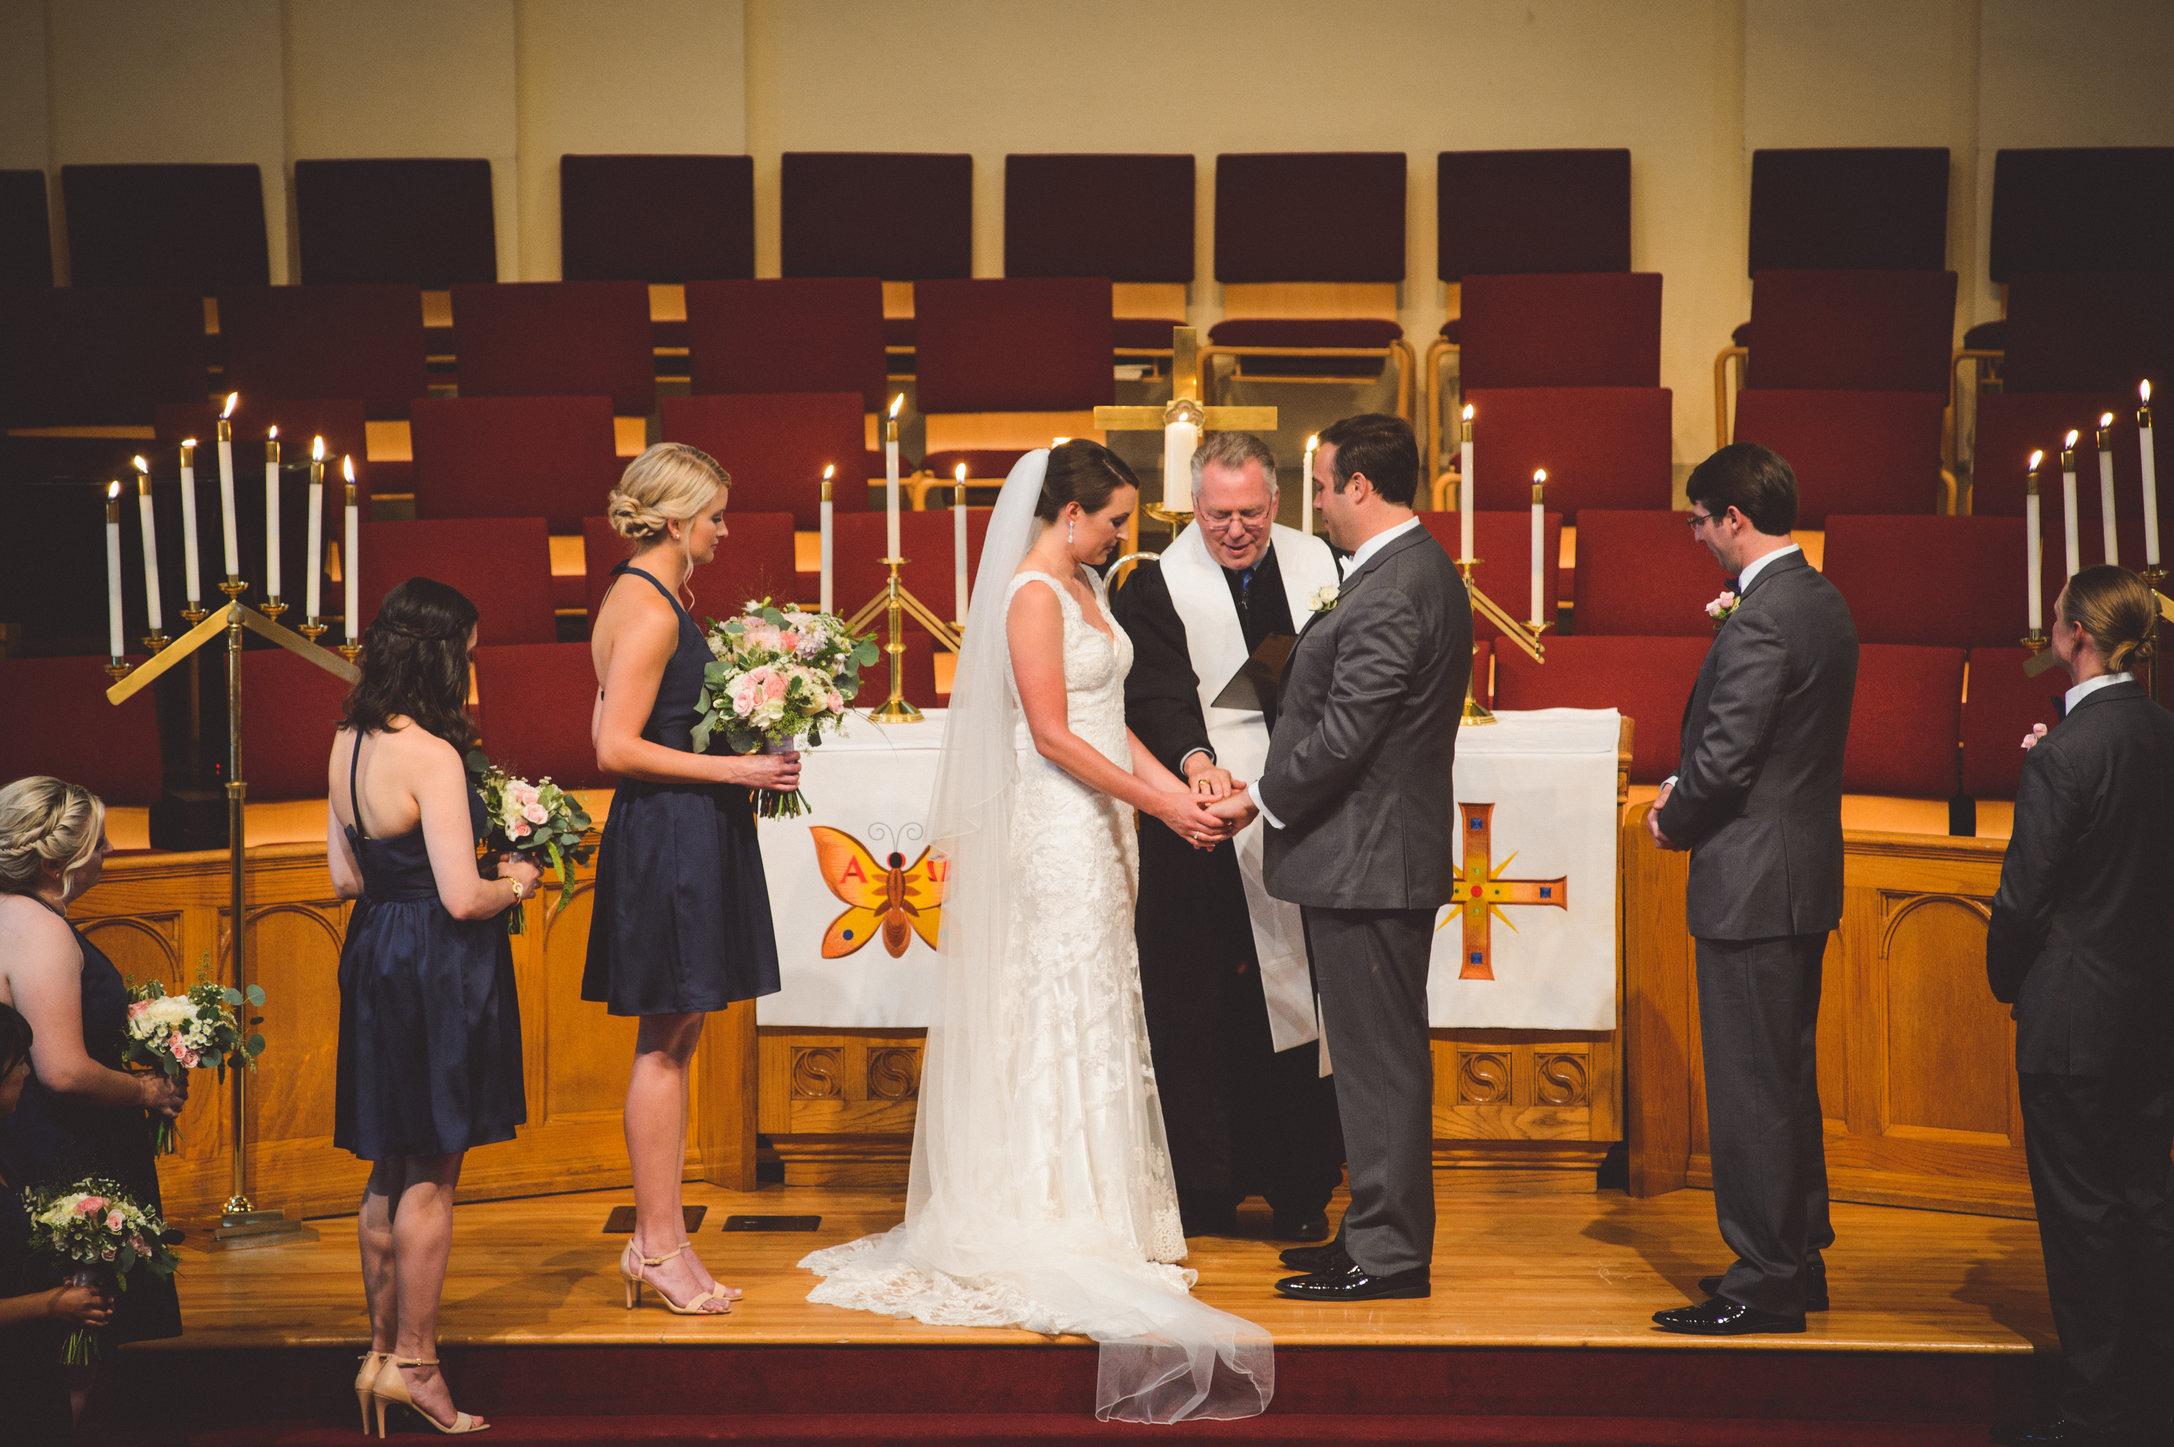 SandC-wedding-217.jpg